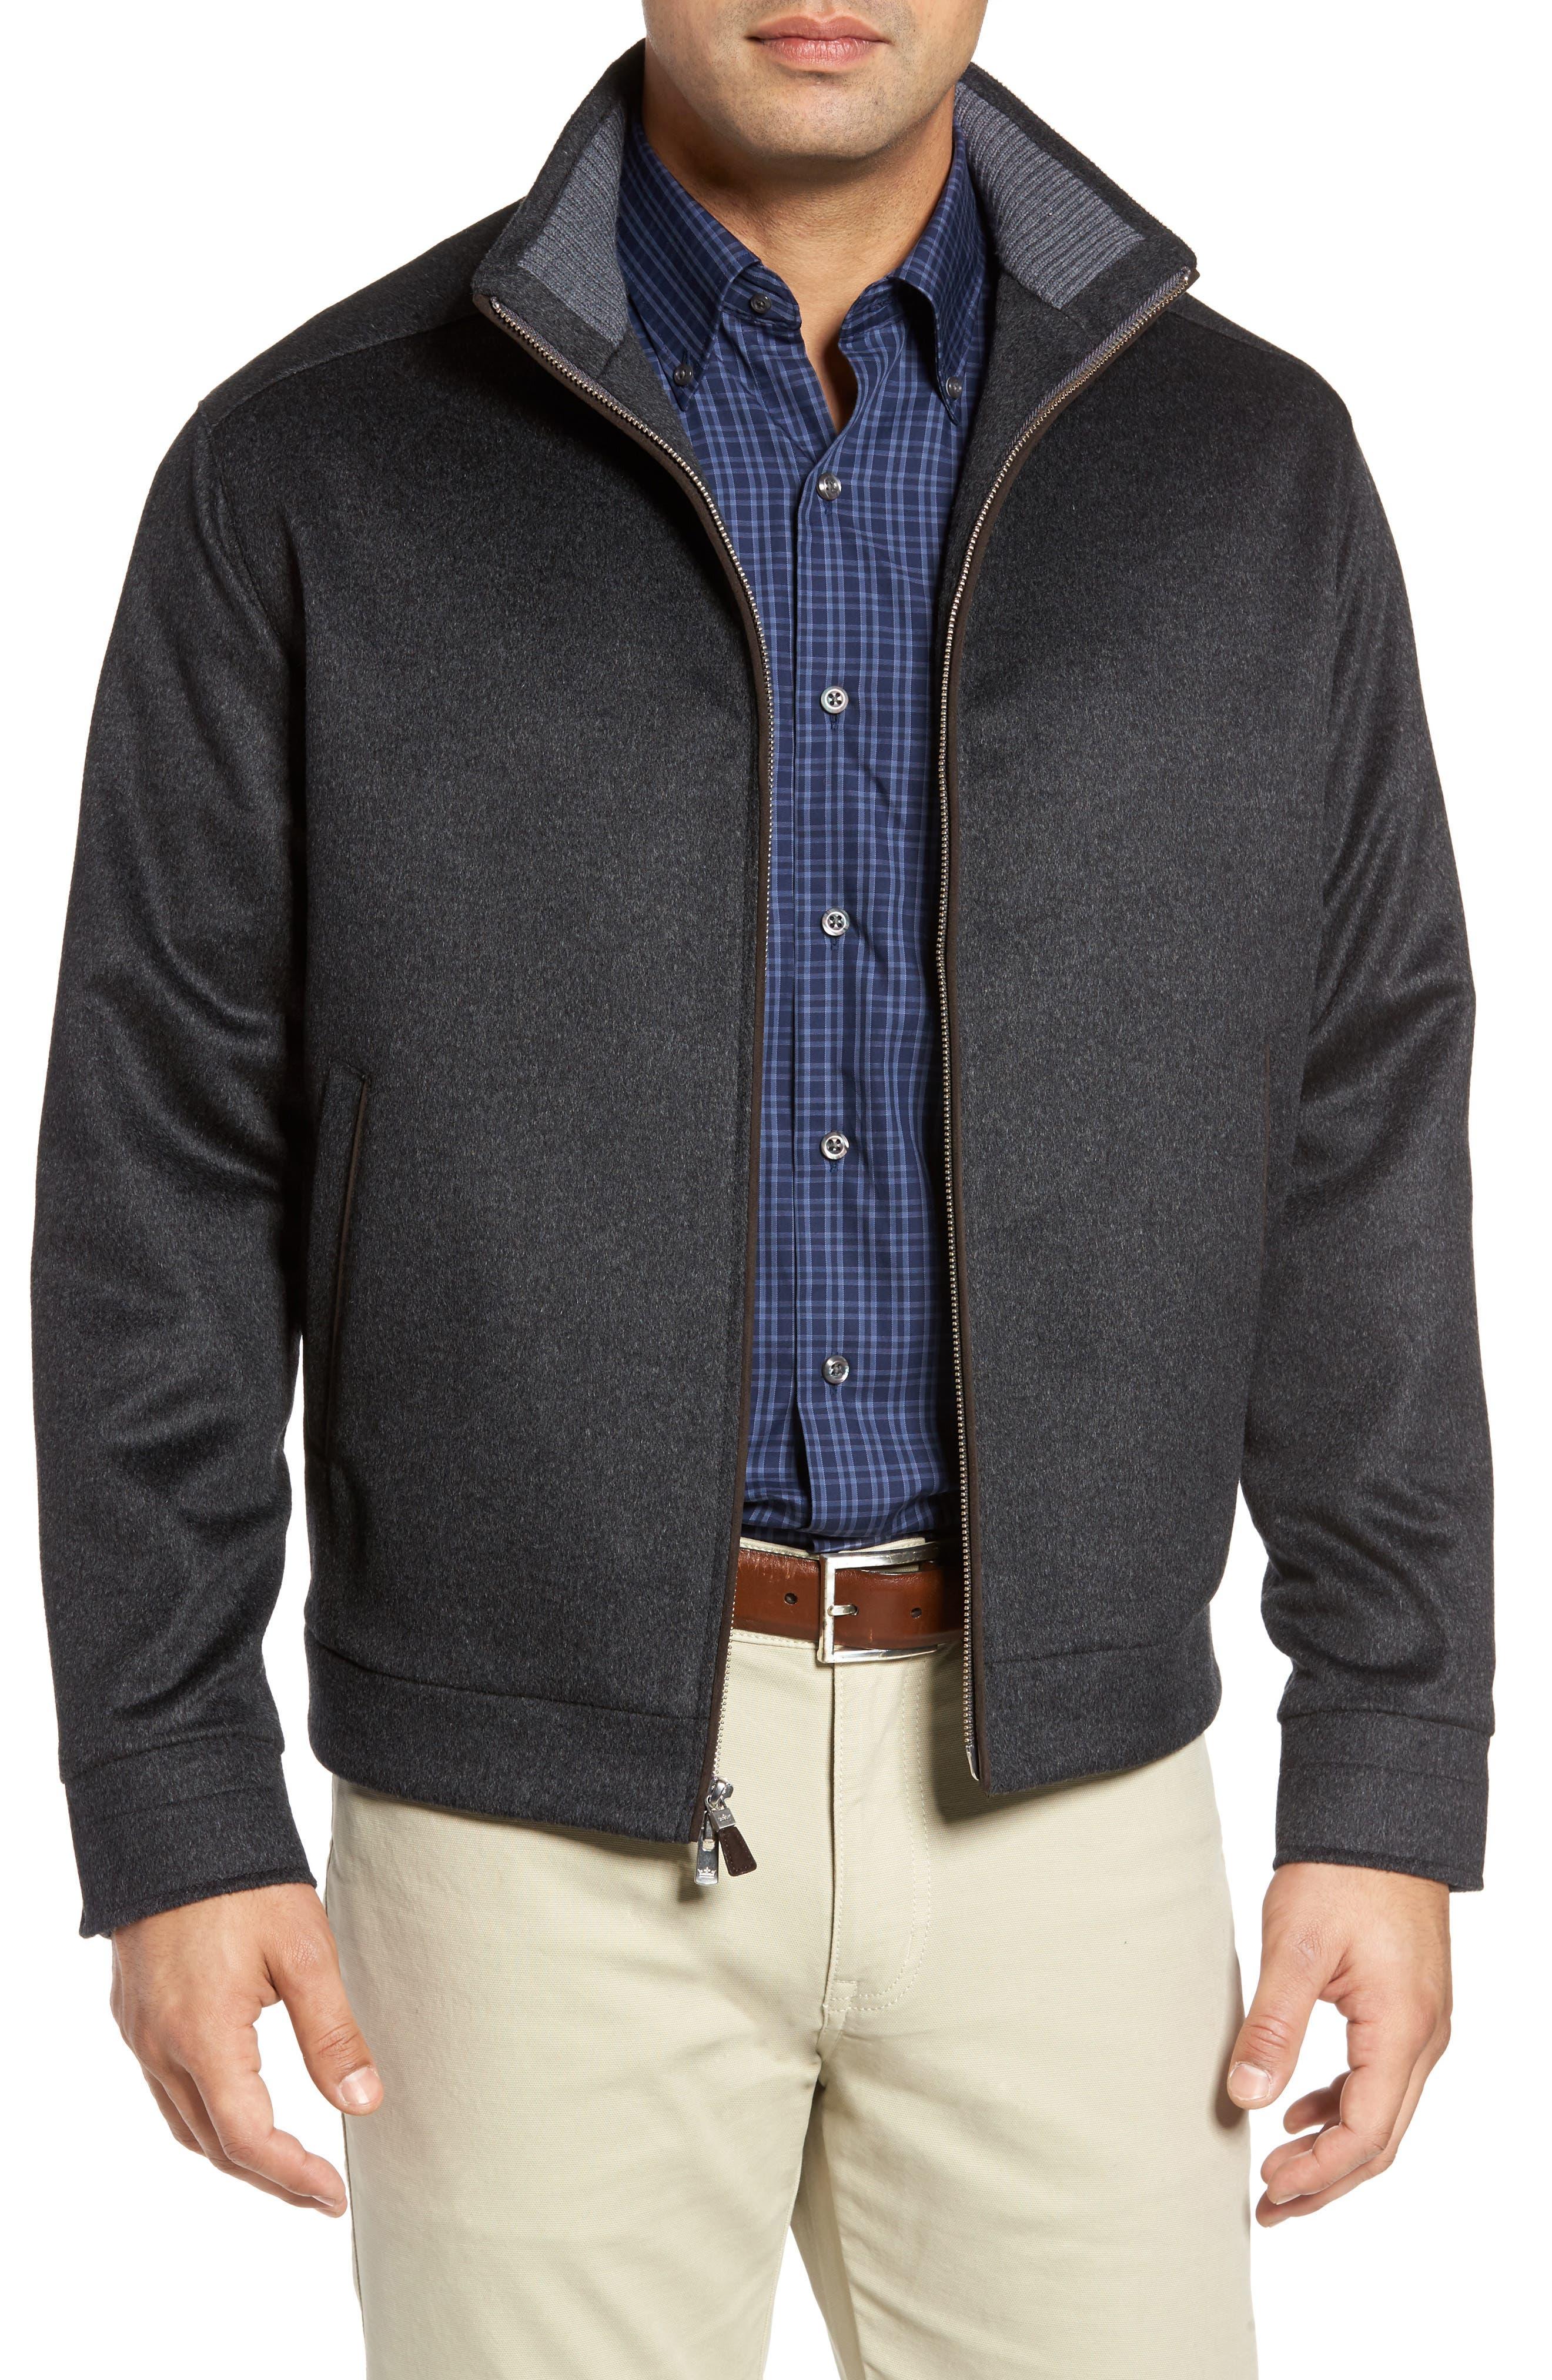 Peter Millar Westport Wool & Cashmere Jacket